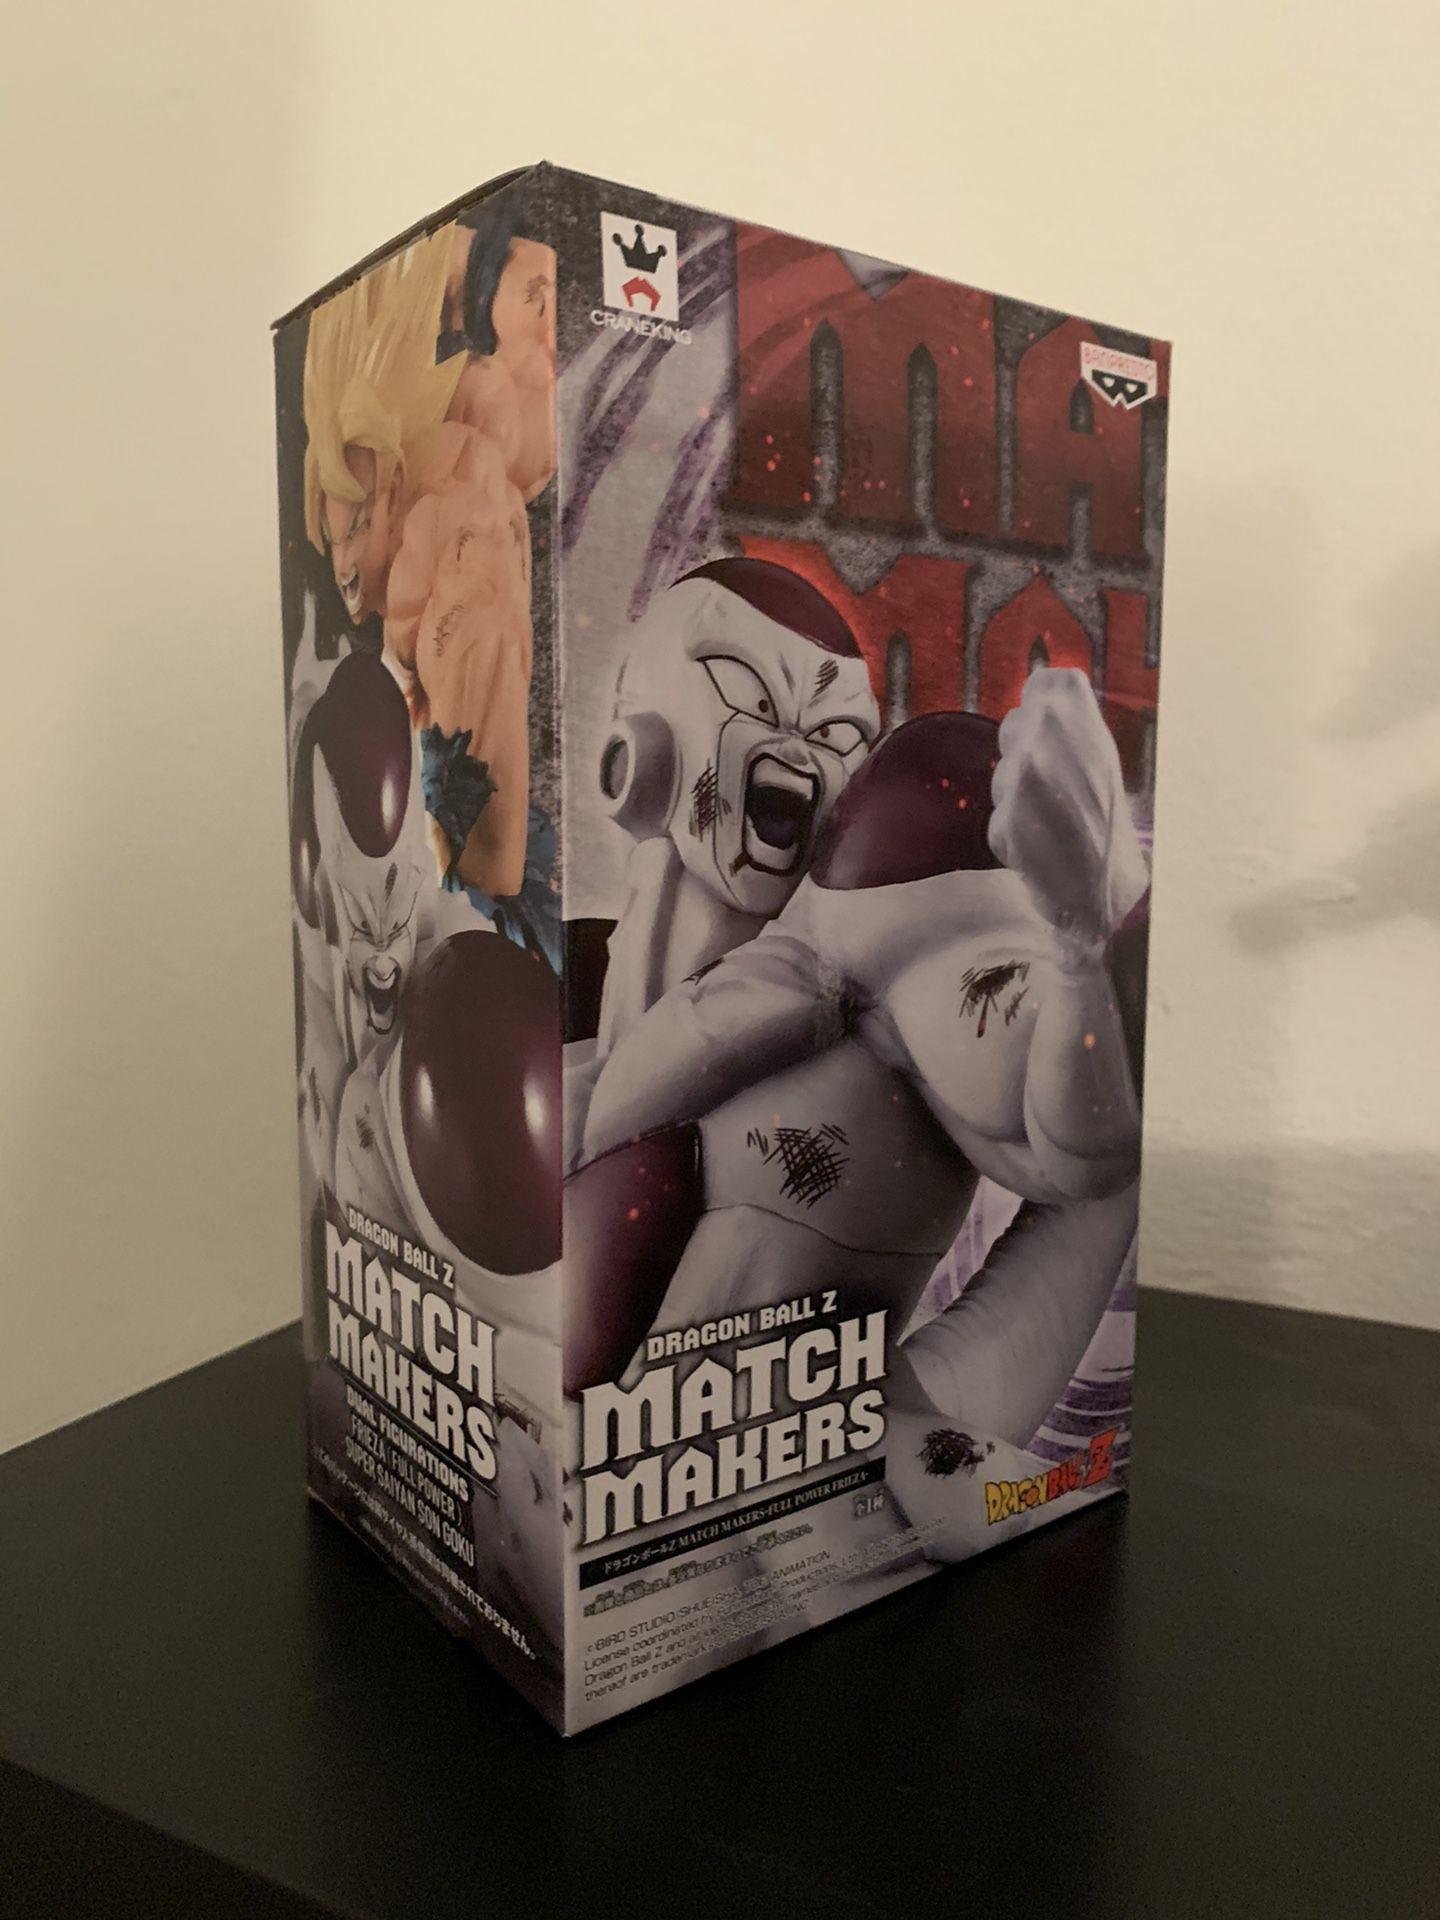 Full Power Frieza Statue | Banpresto | Match Makers | Dragonball Z